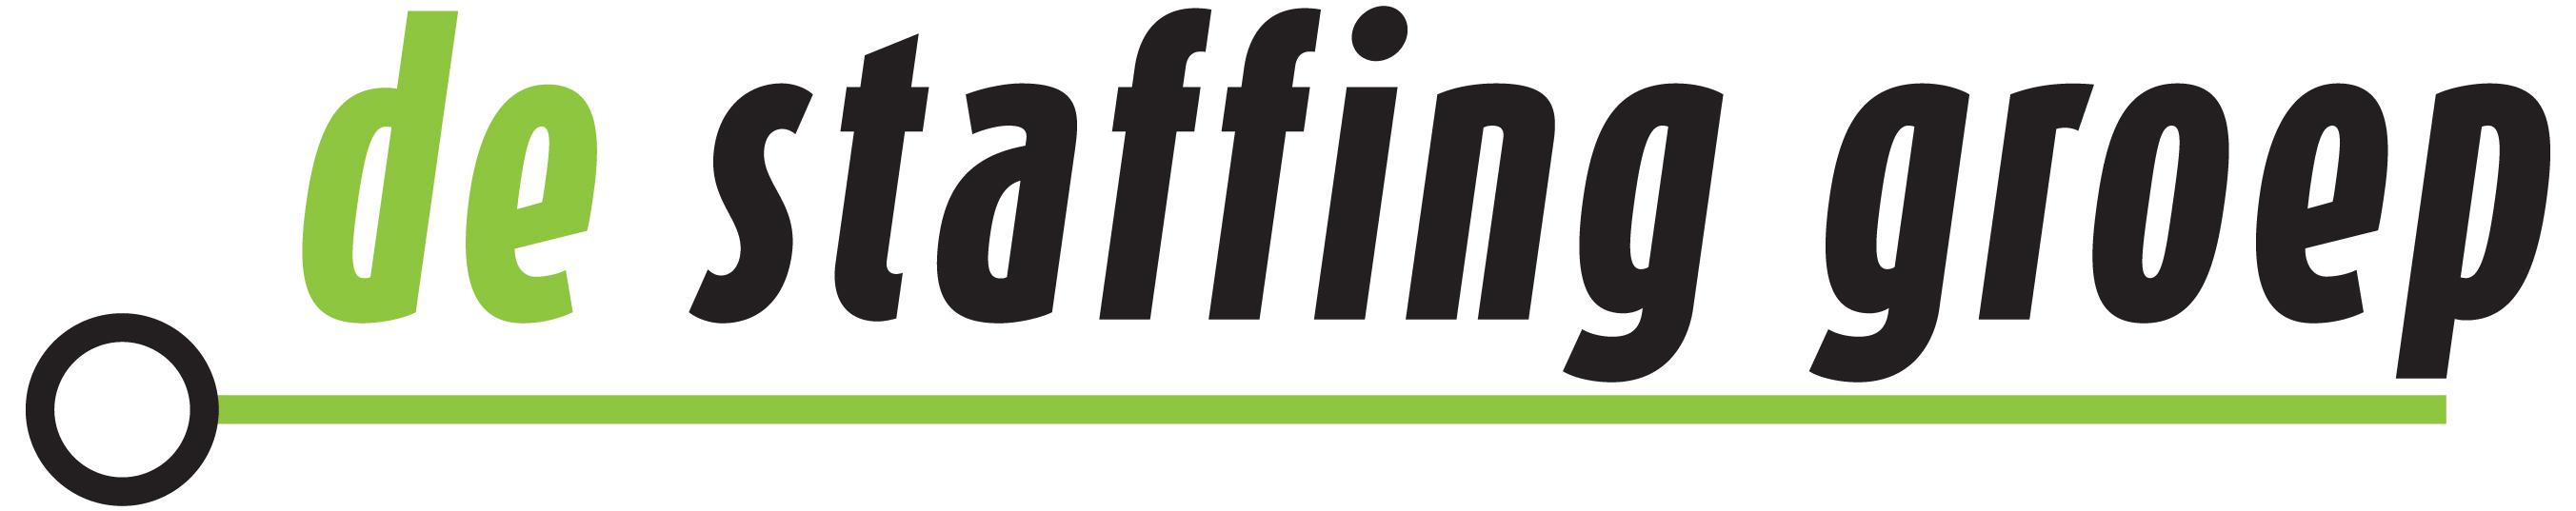 de staffing groep logo